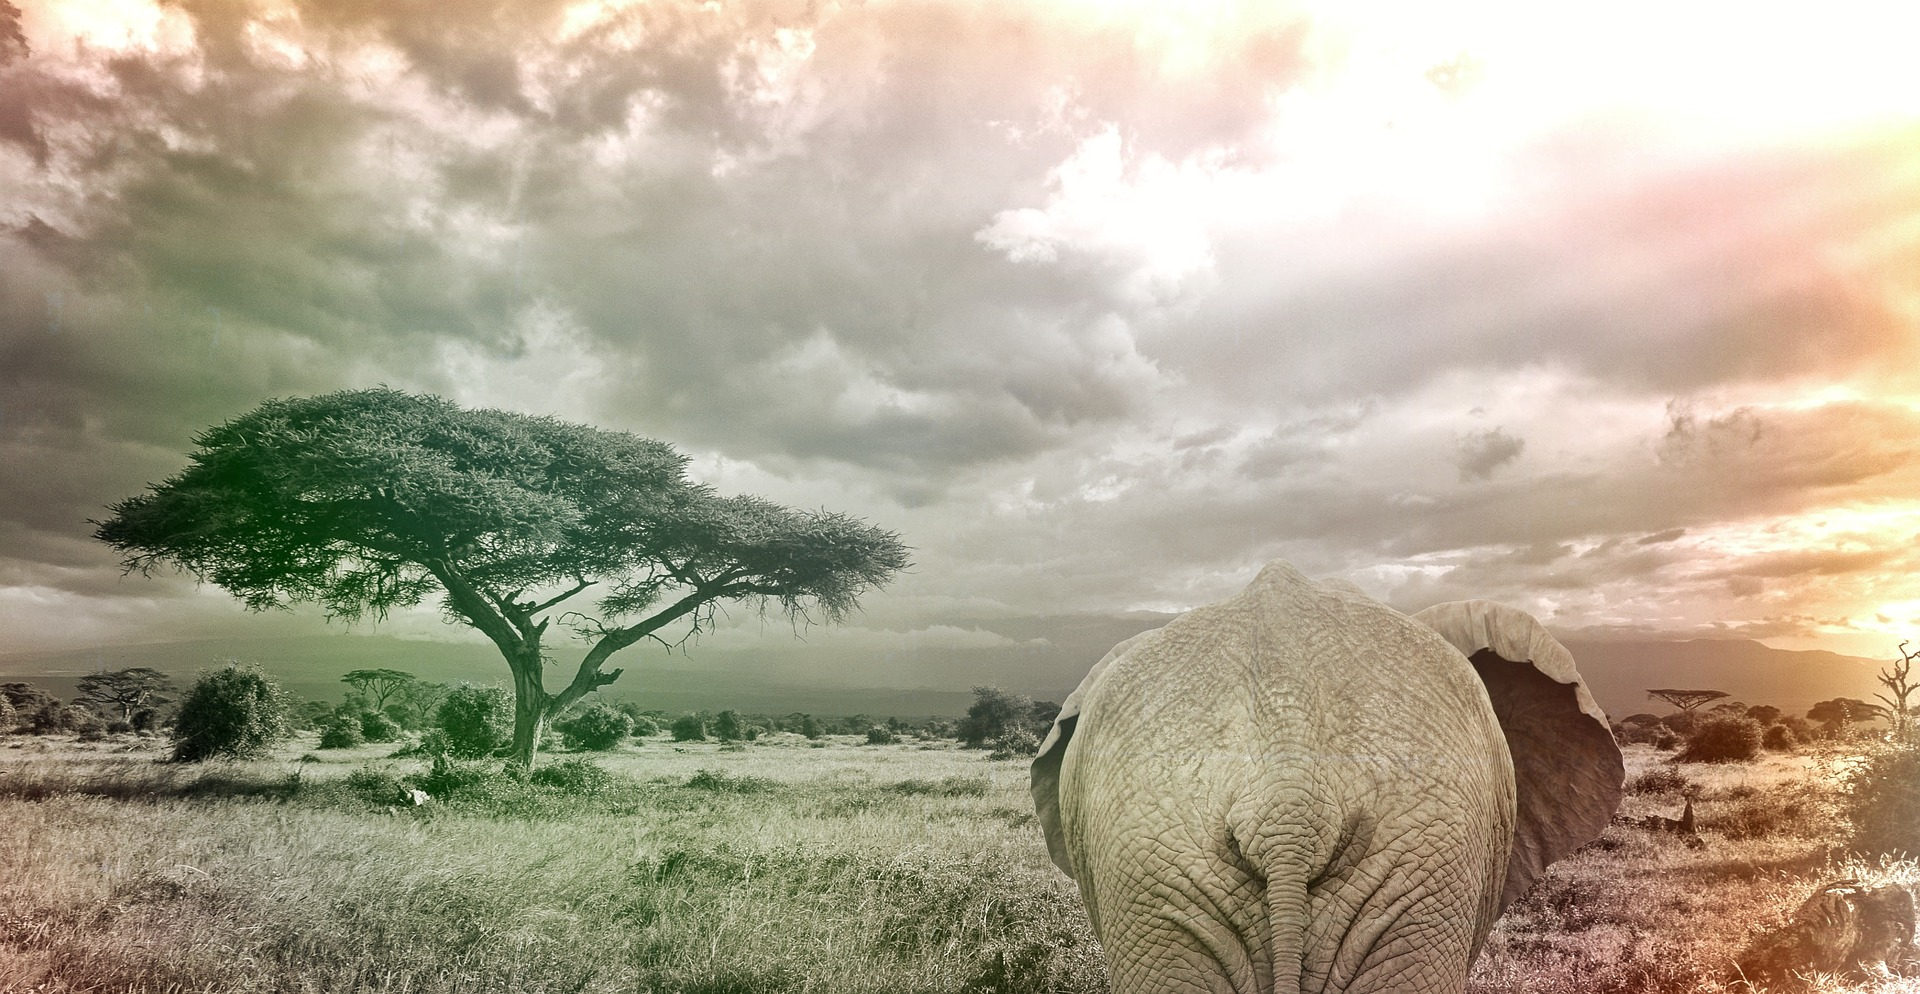 elephant-1067474_1920